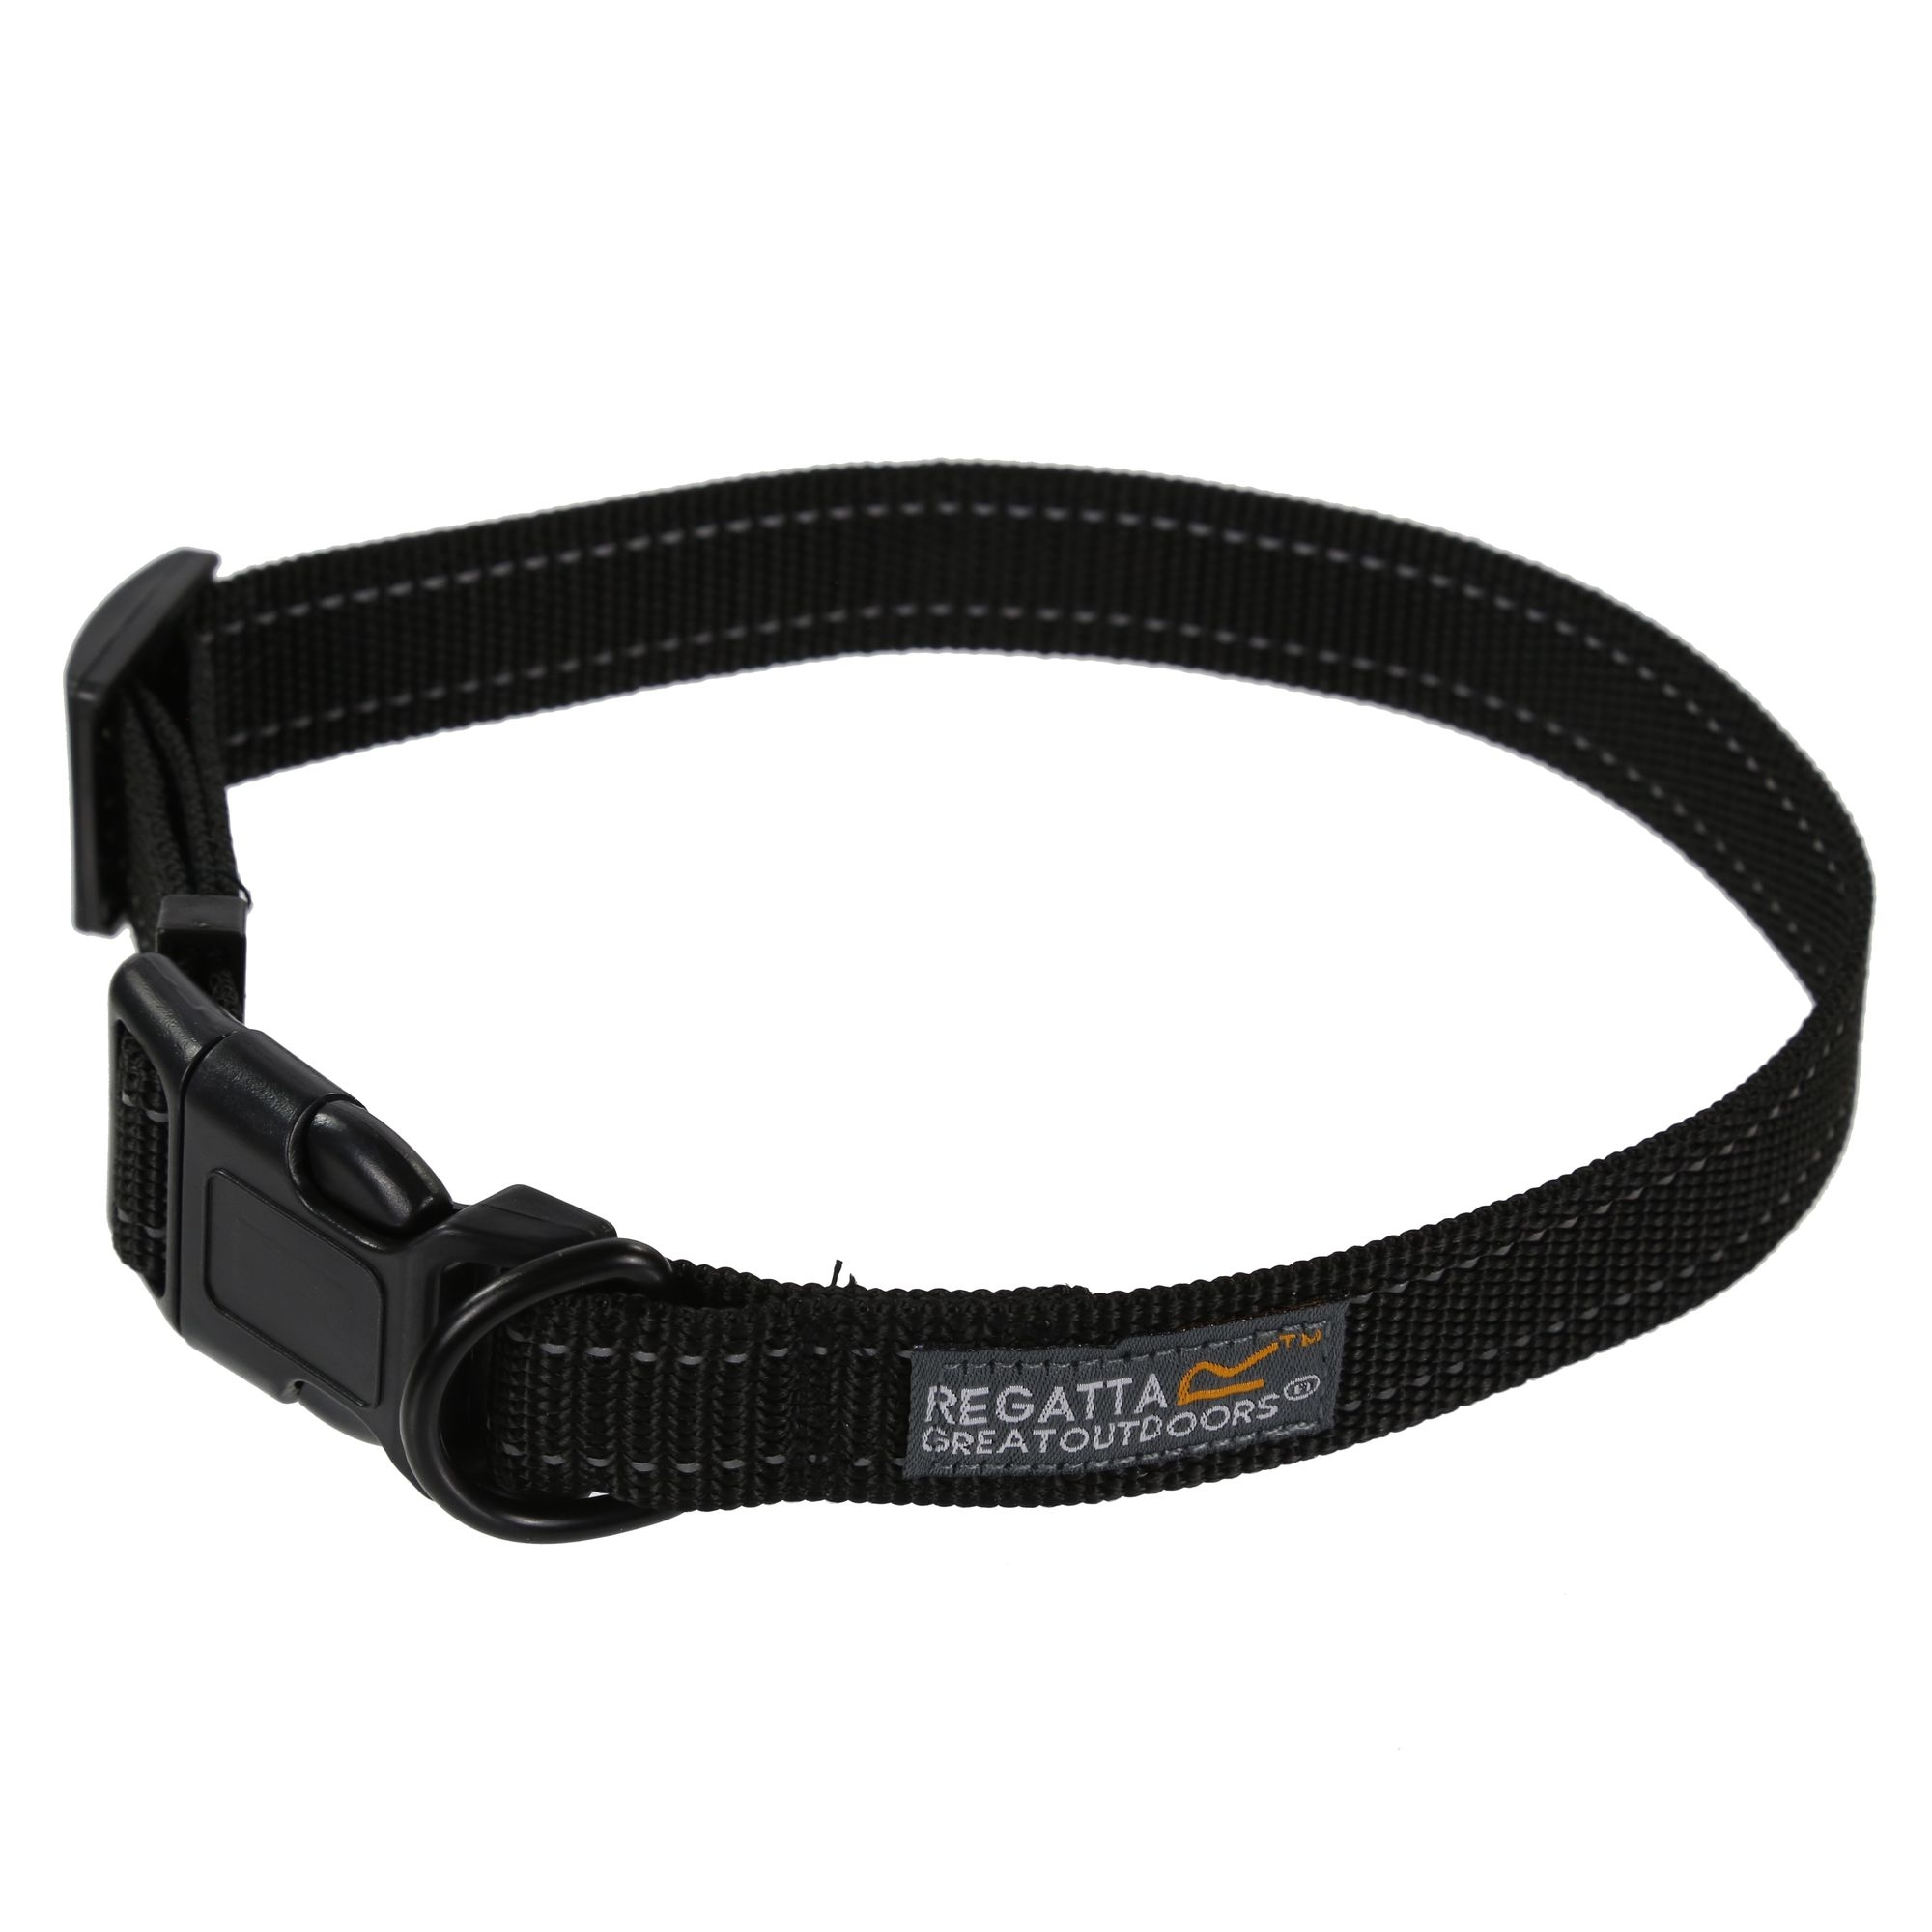 Regatta Comfort Dog Collar